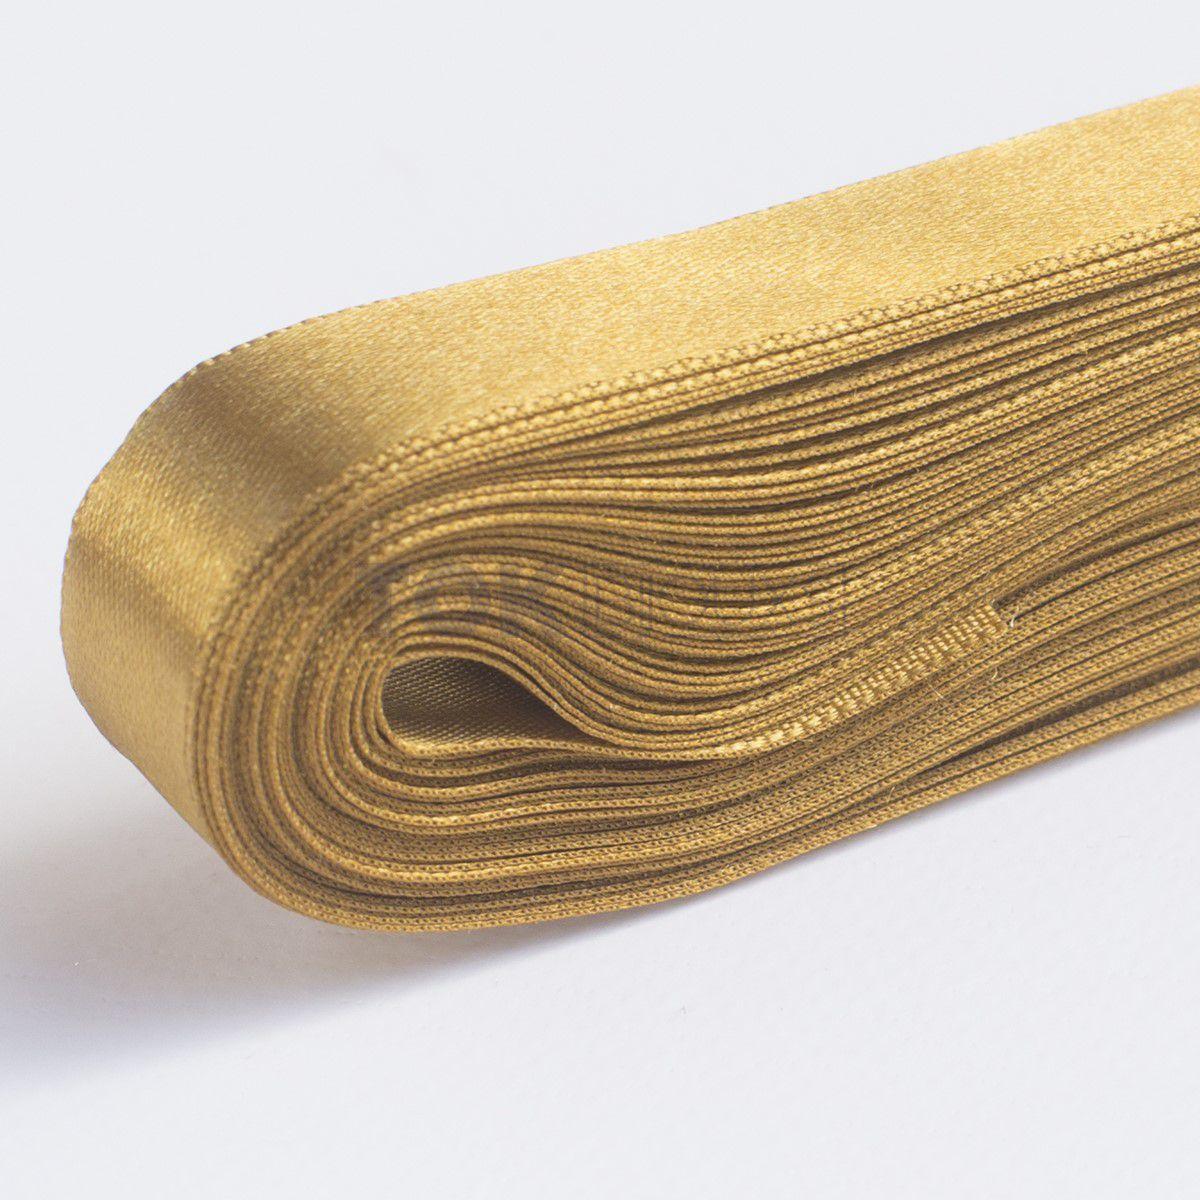 Fita Cetim N.2 - 10mm - 10 Metros - COR (47) Dourado